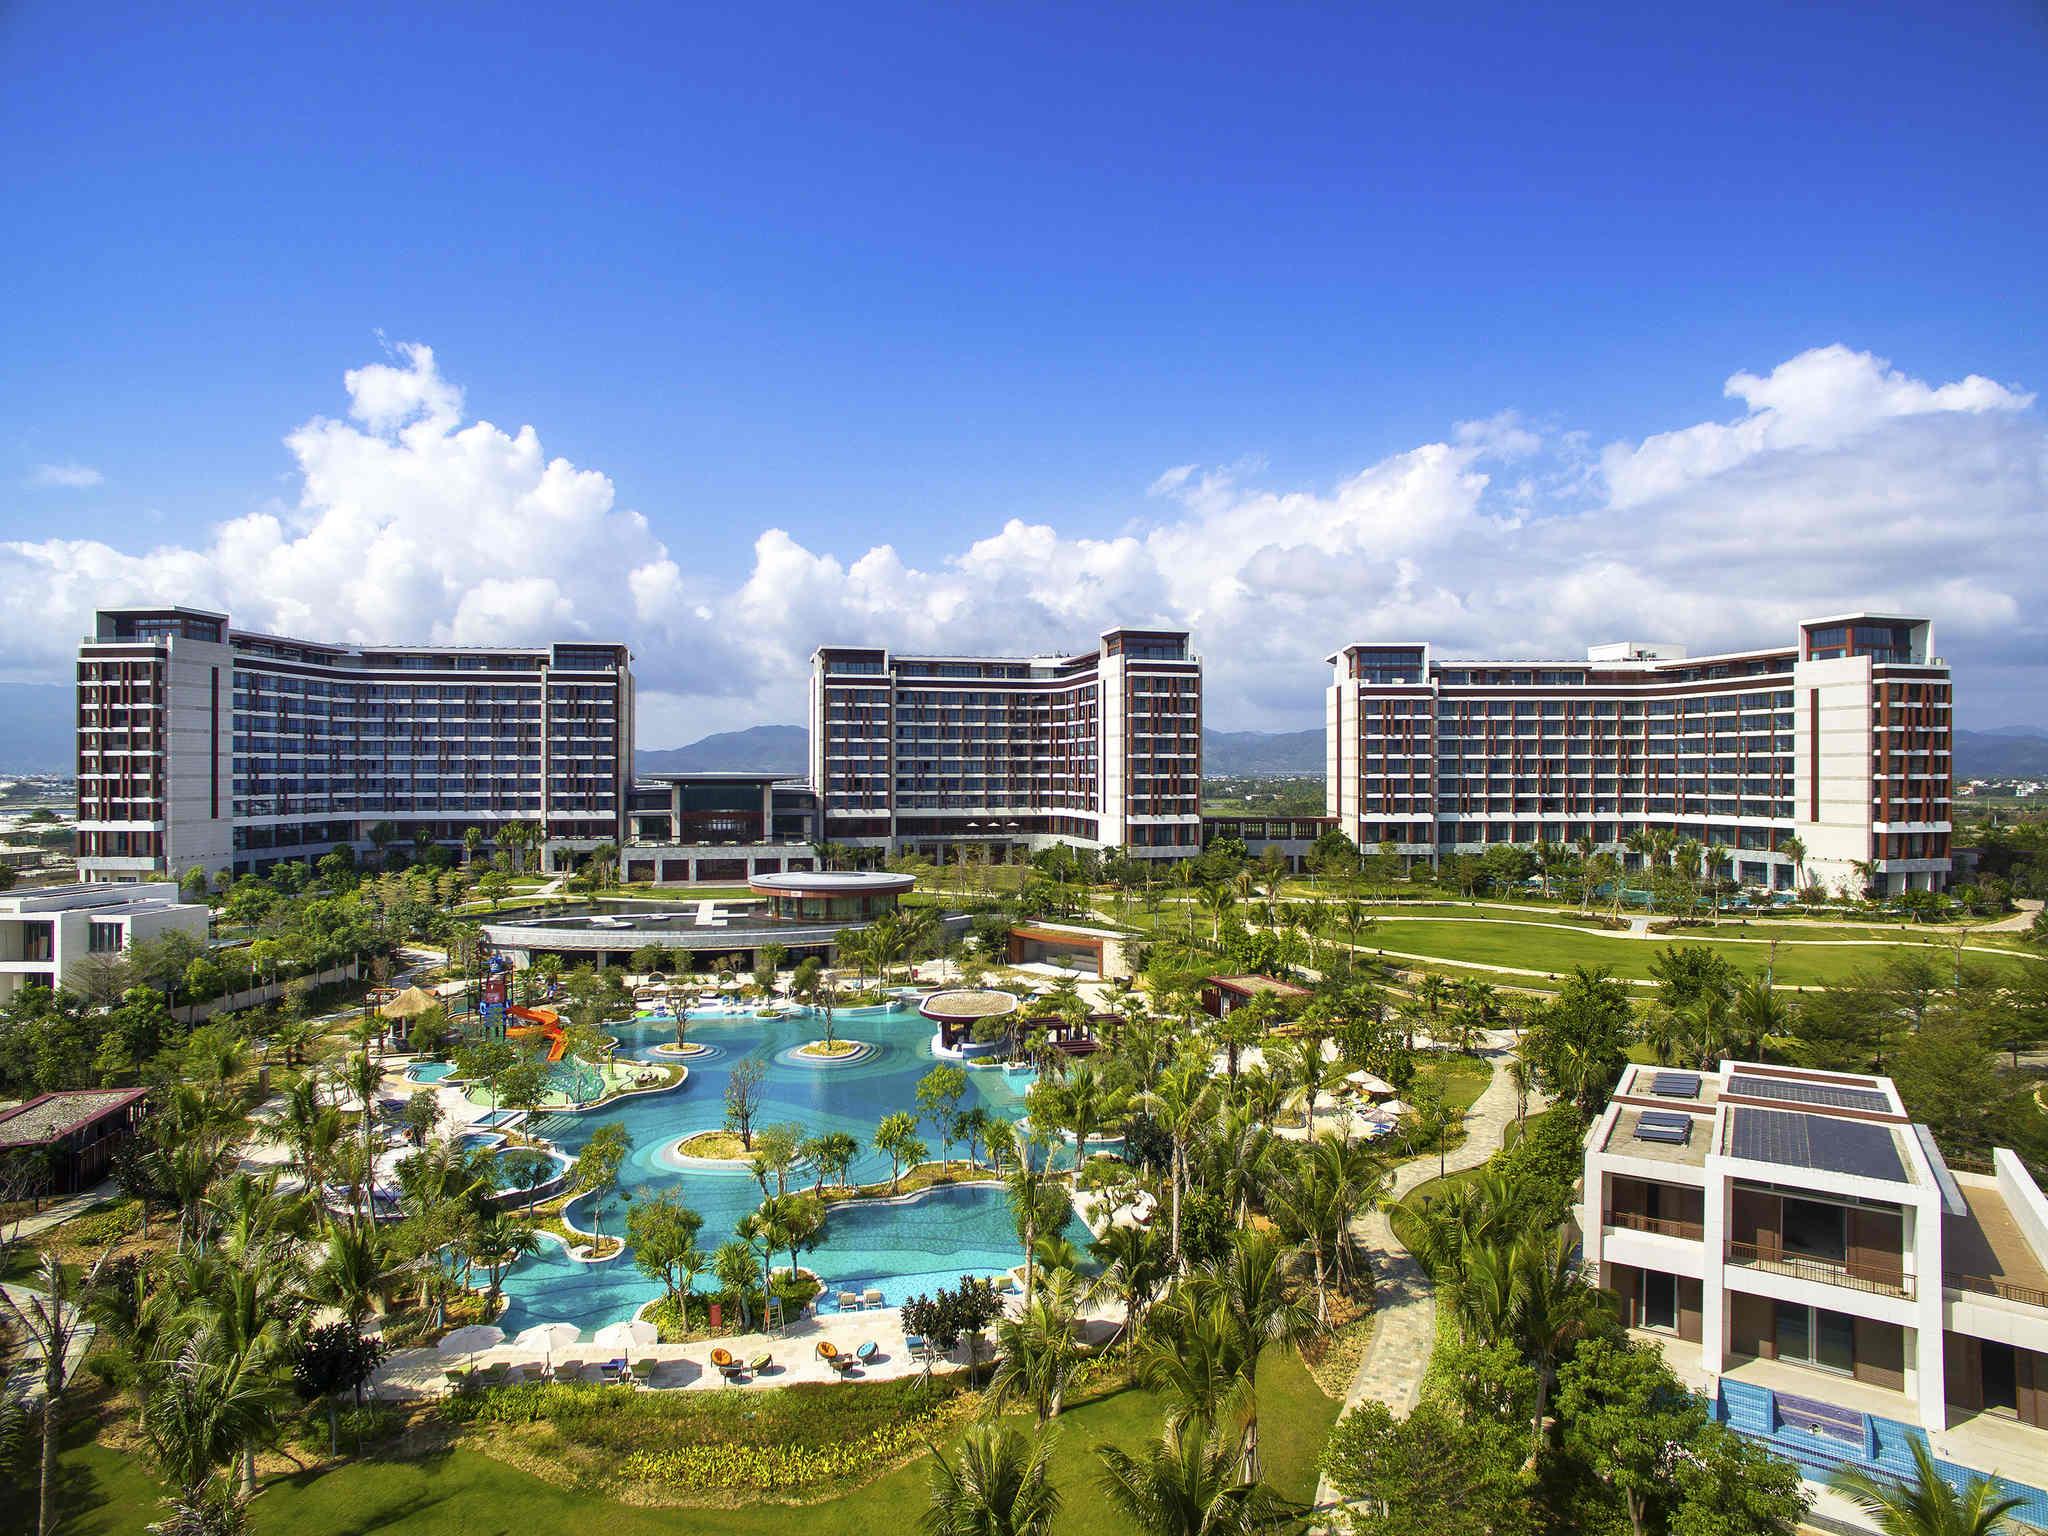 Hotel – Sofitel Sanya Leeman Resort